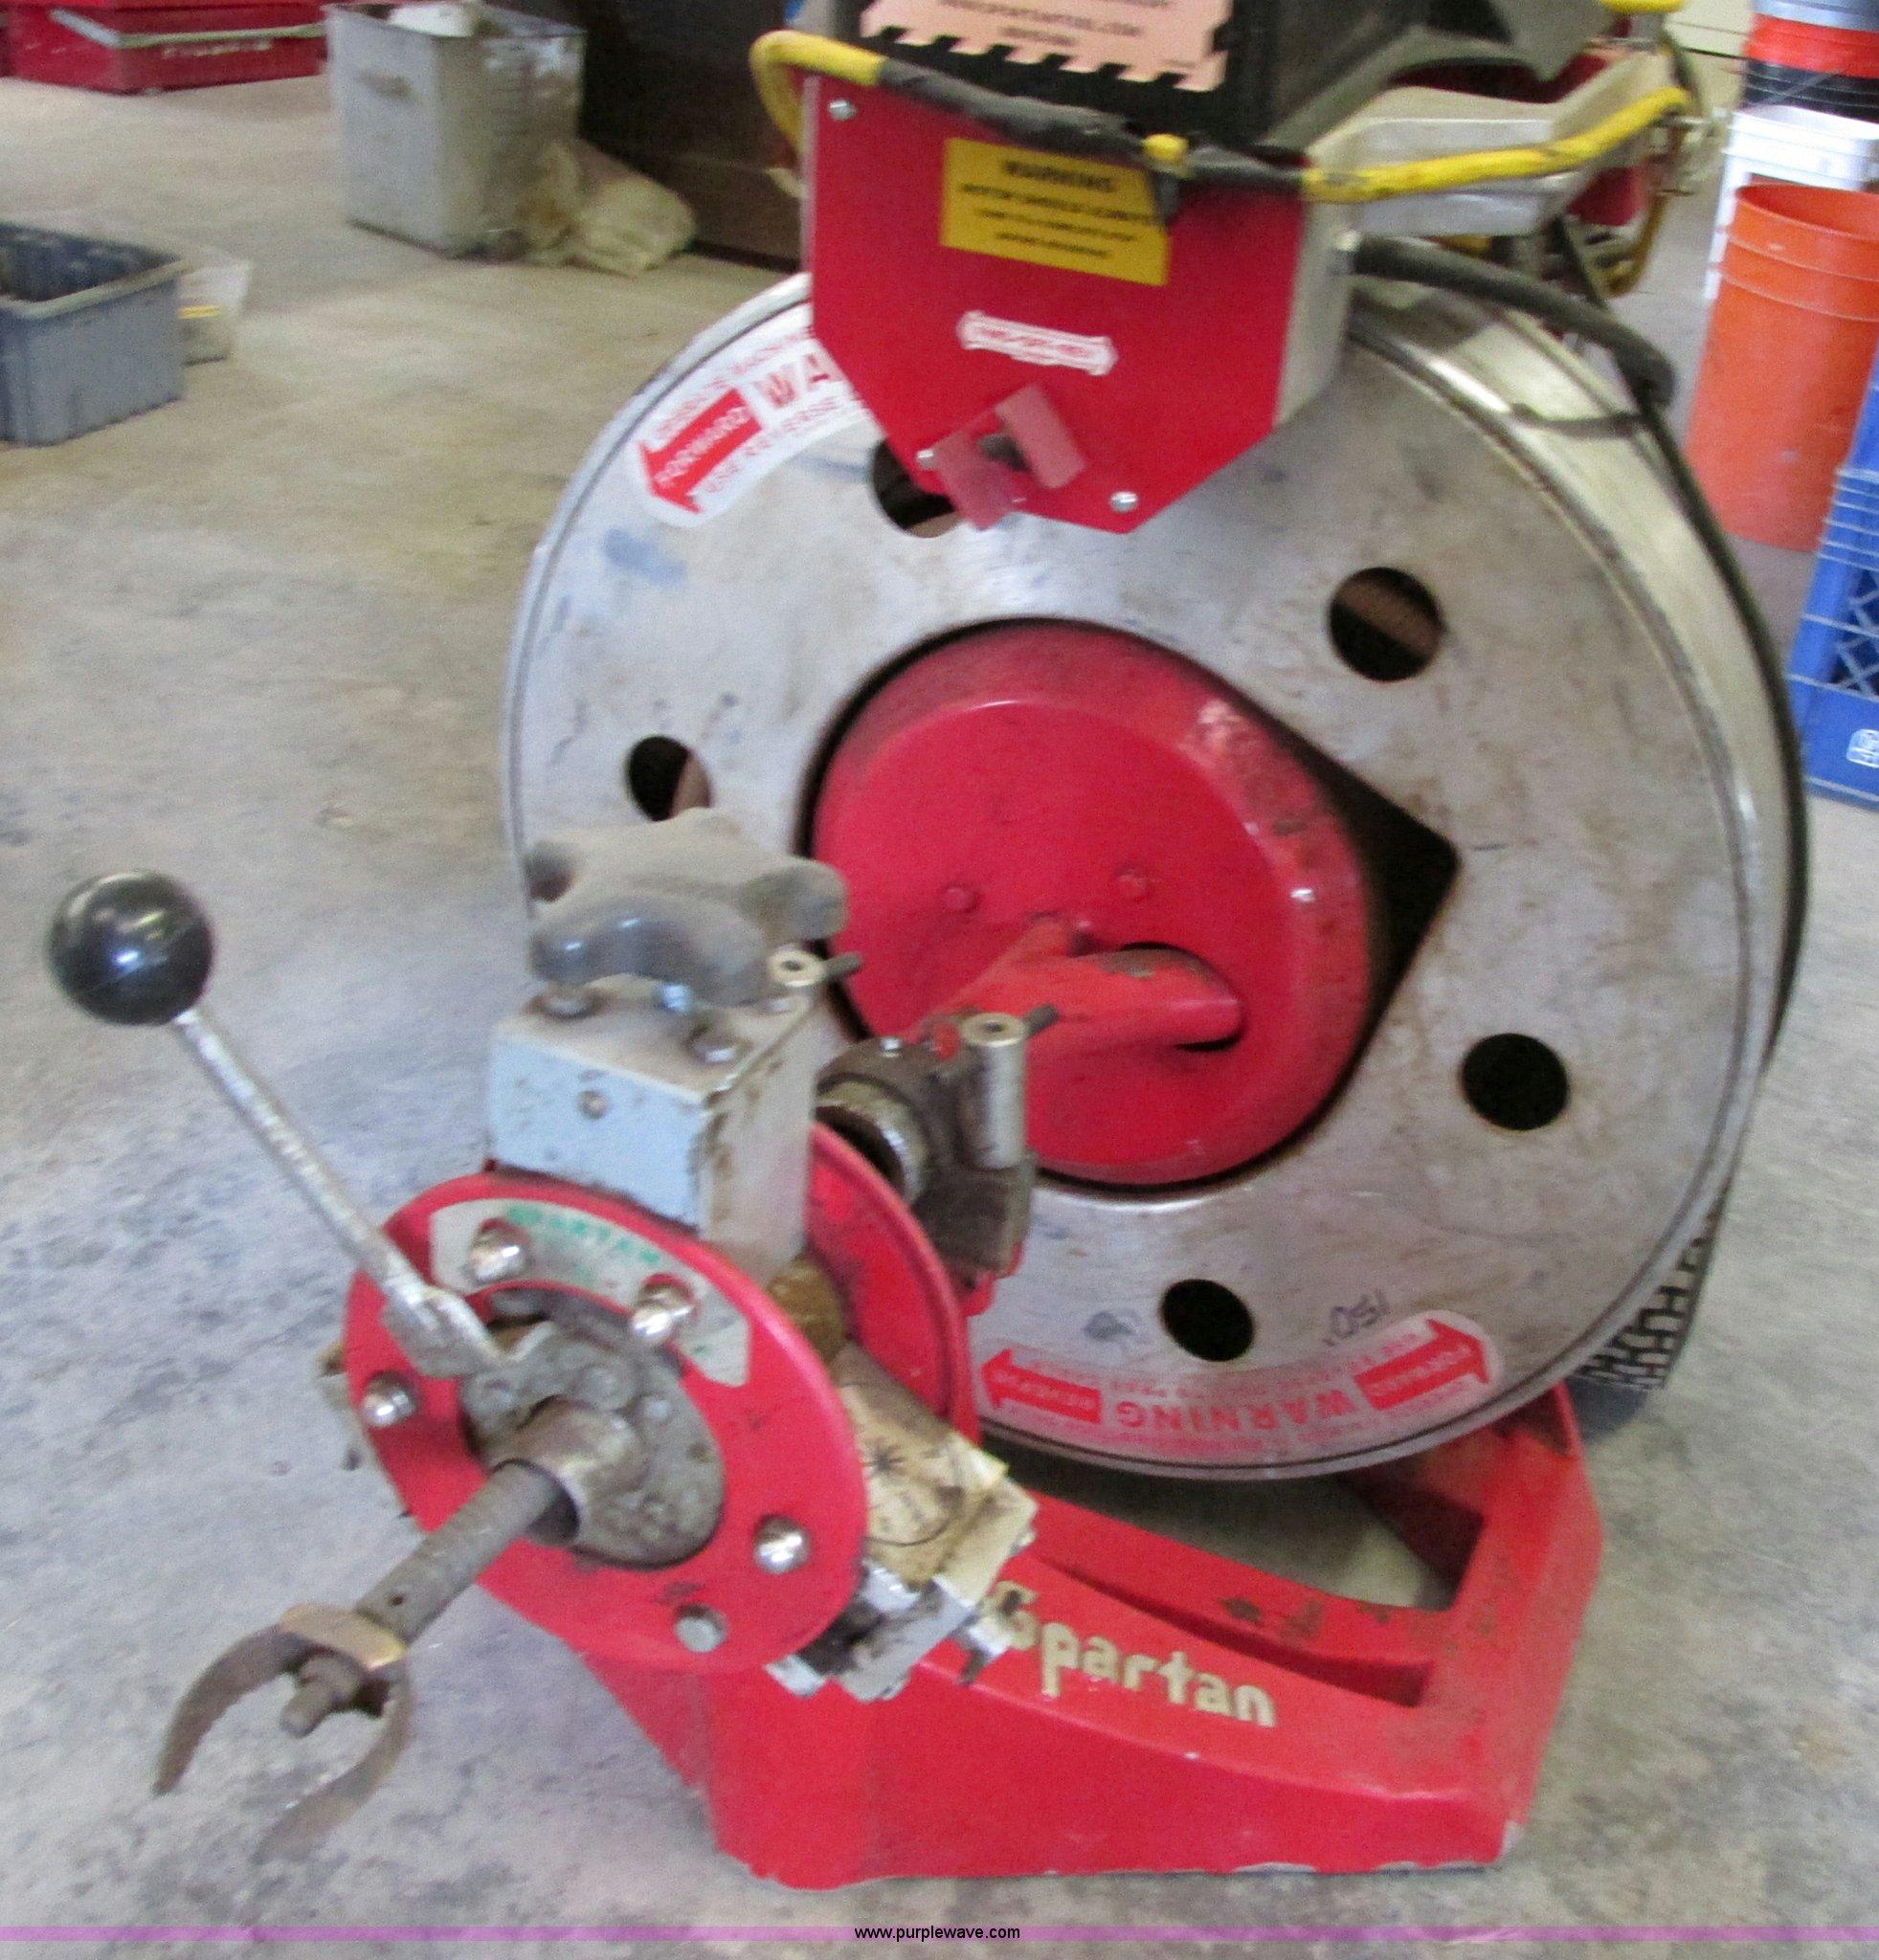 2008 Spartan 2001 Commercial Sewer Auger Item Z9243